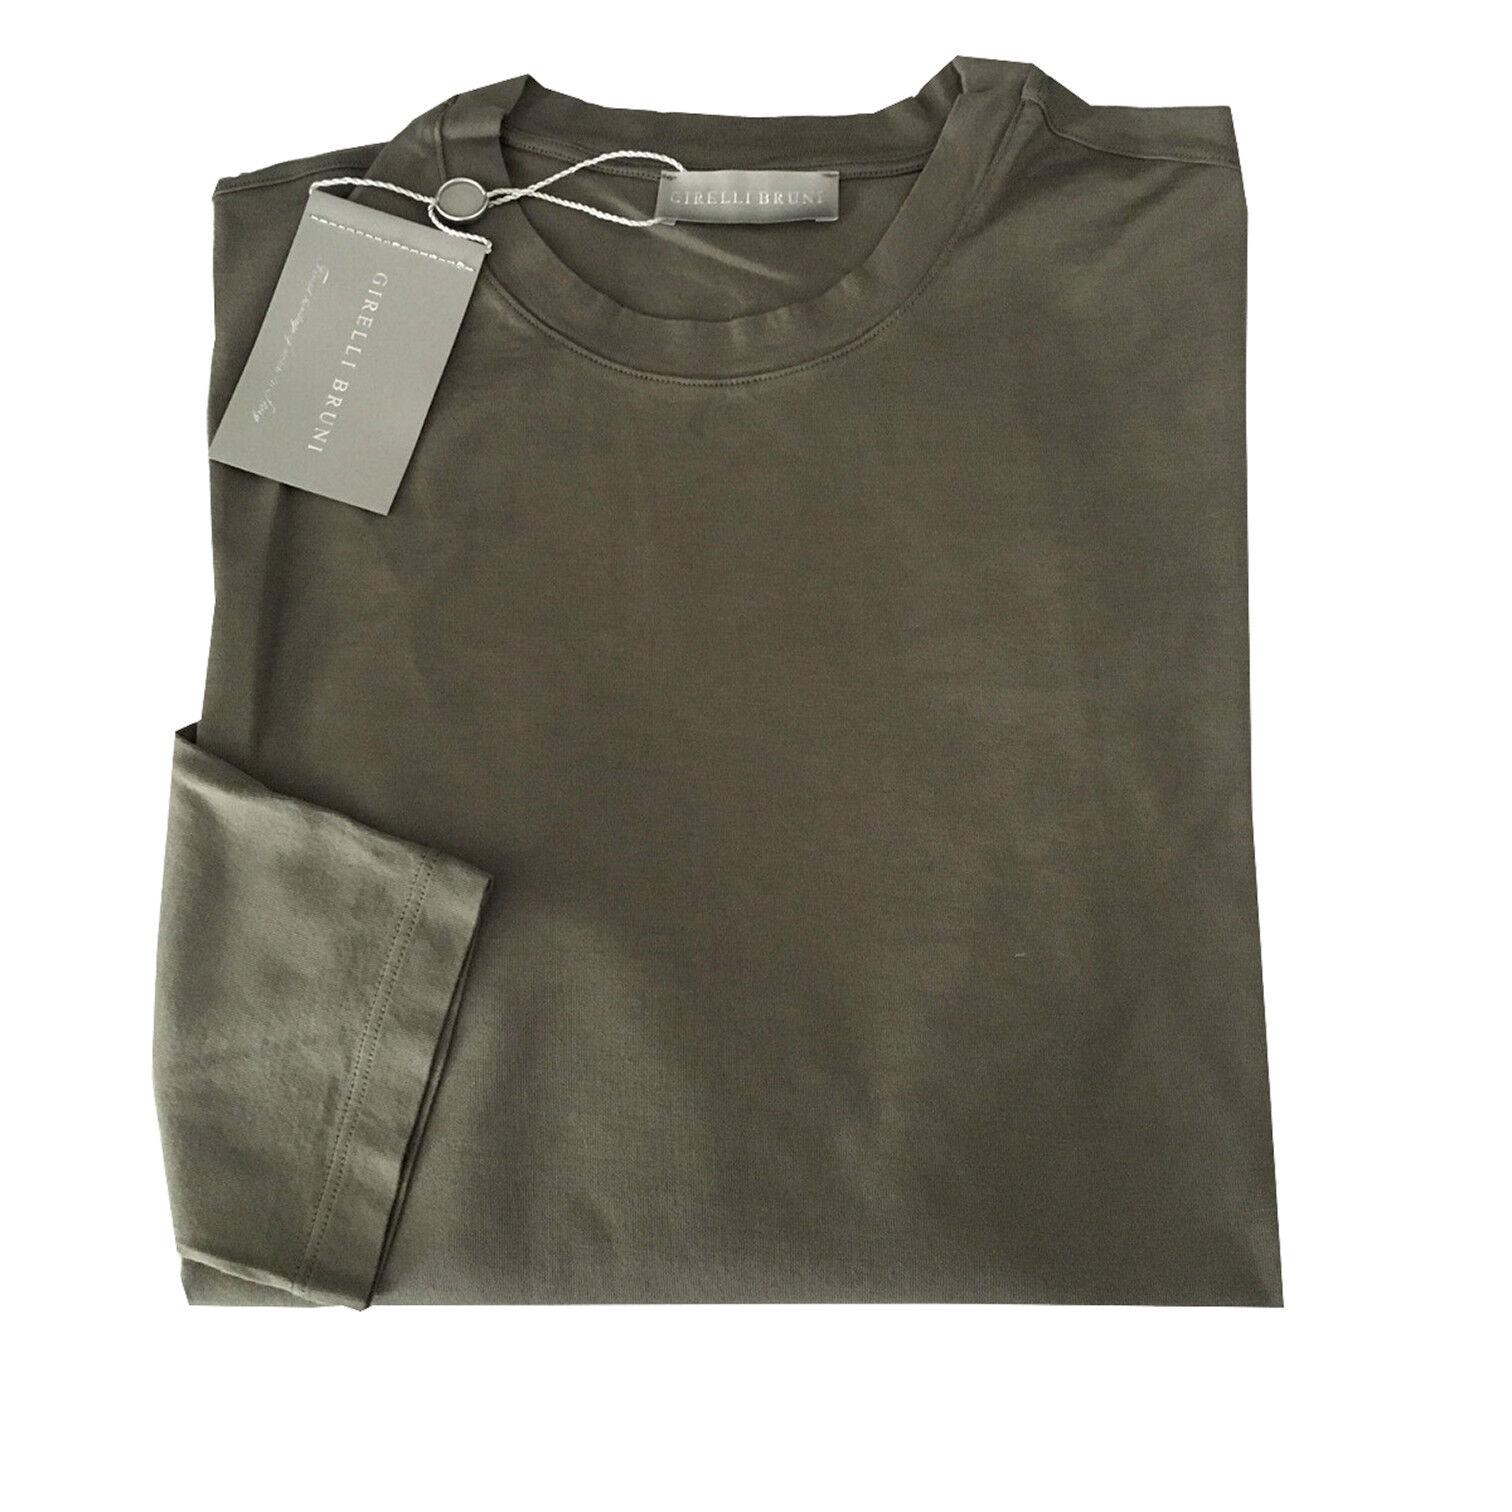 GIRELLI BRUNI T-Shirt Herren lange Ärmel military braun GIZA 60 in Ita